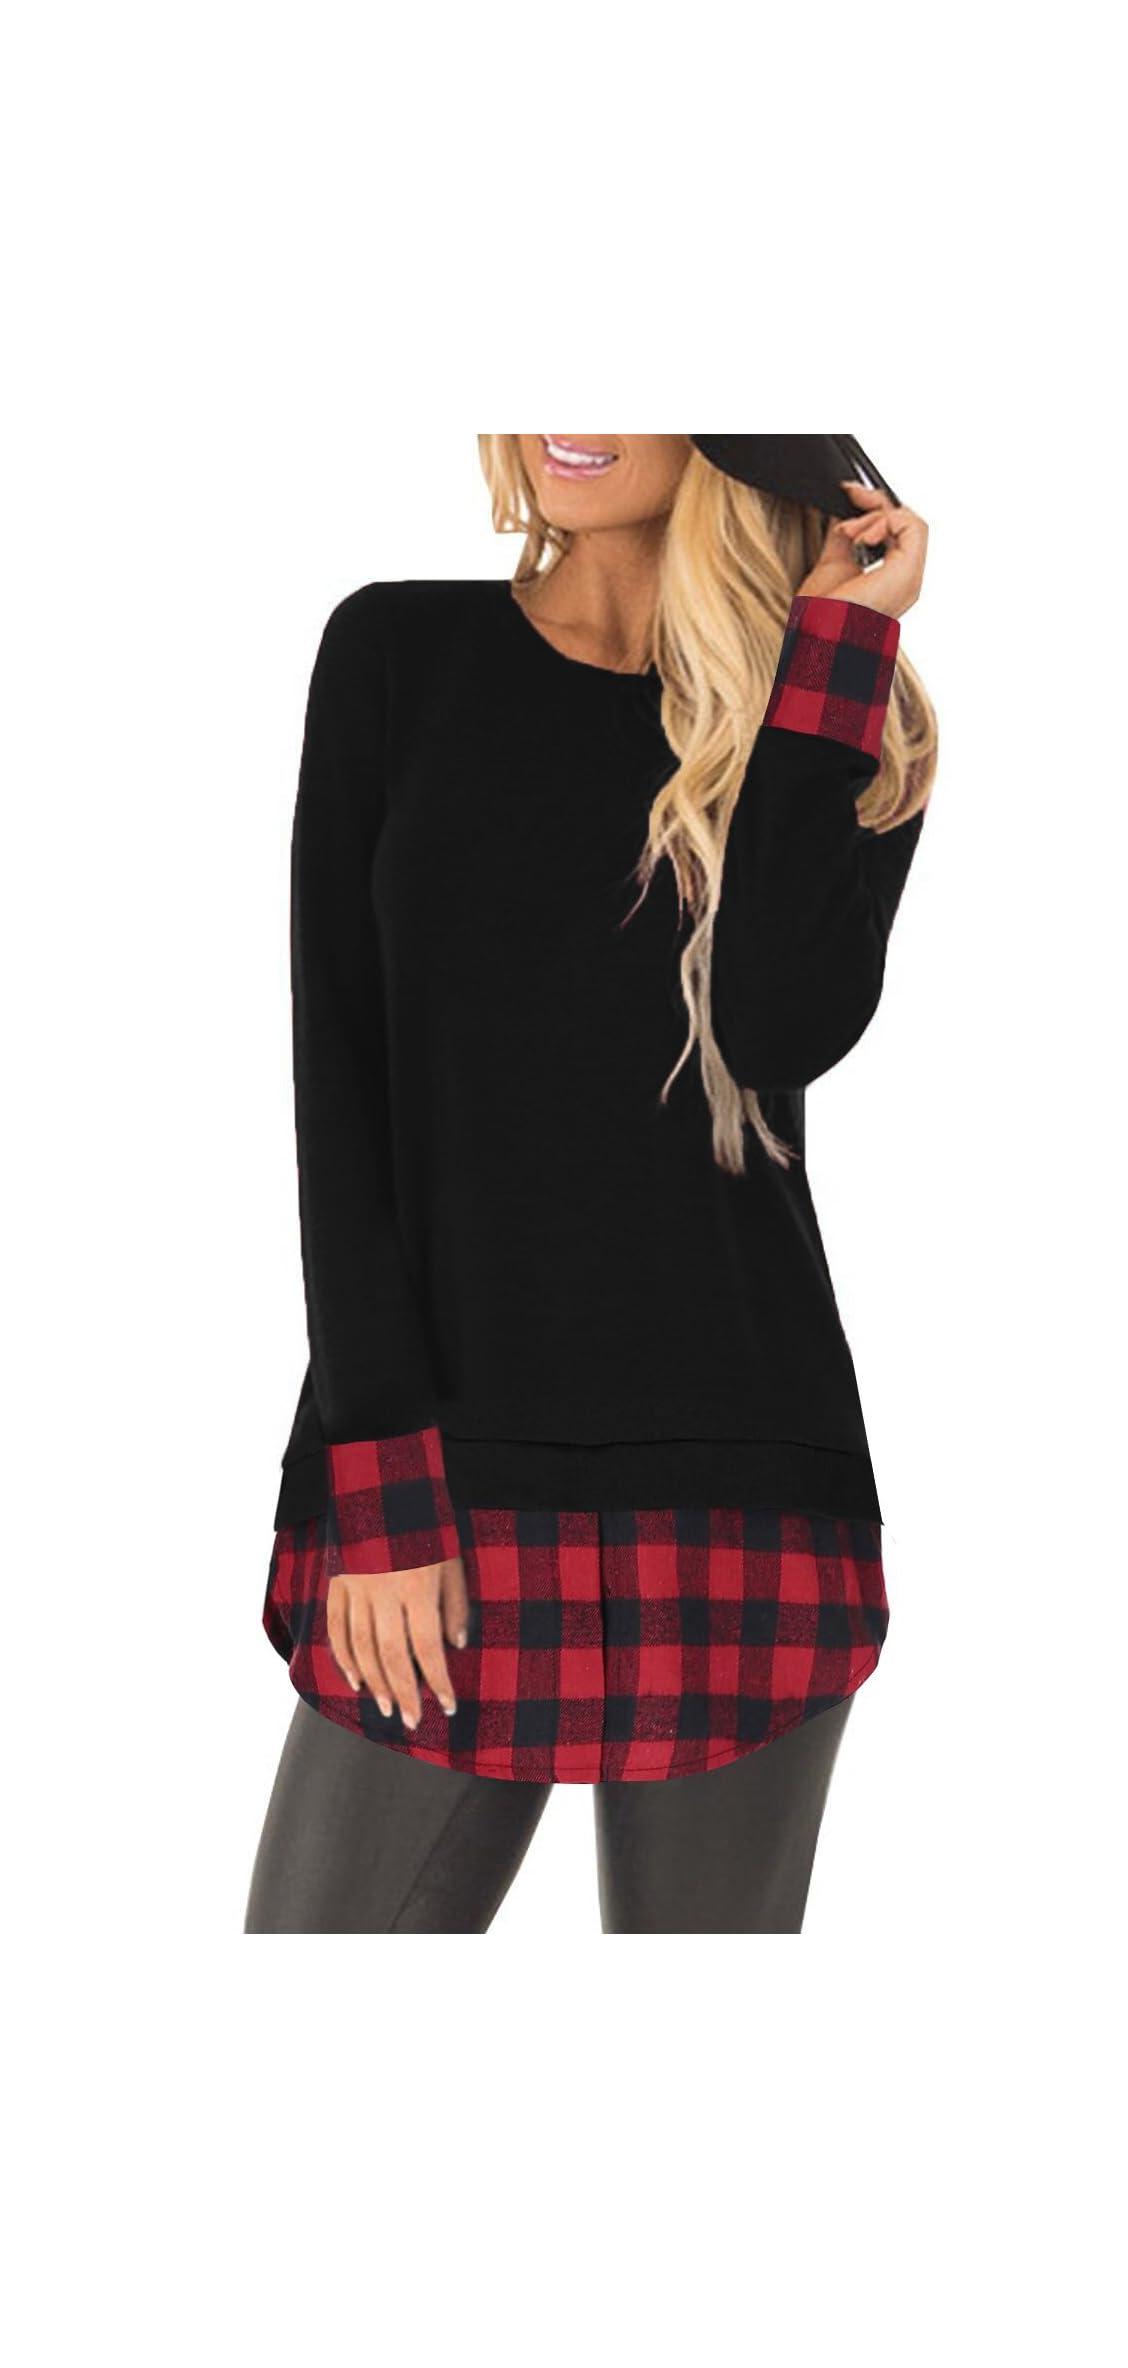 Women's Plaid Shirts Long Sleeve Tees Flannel Crew Neck